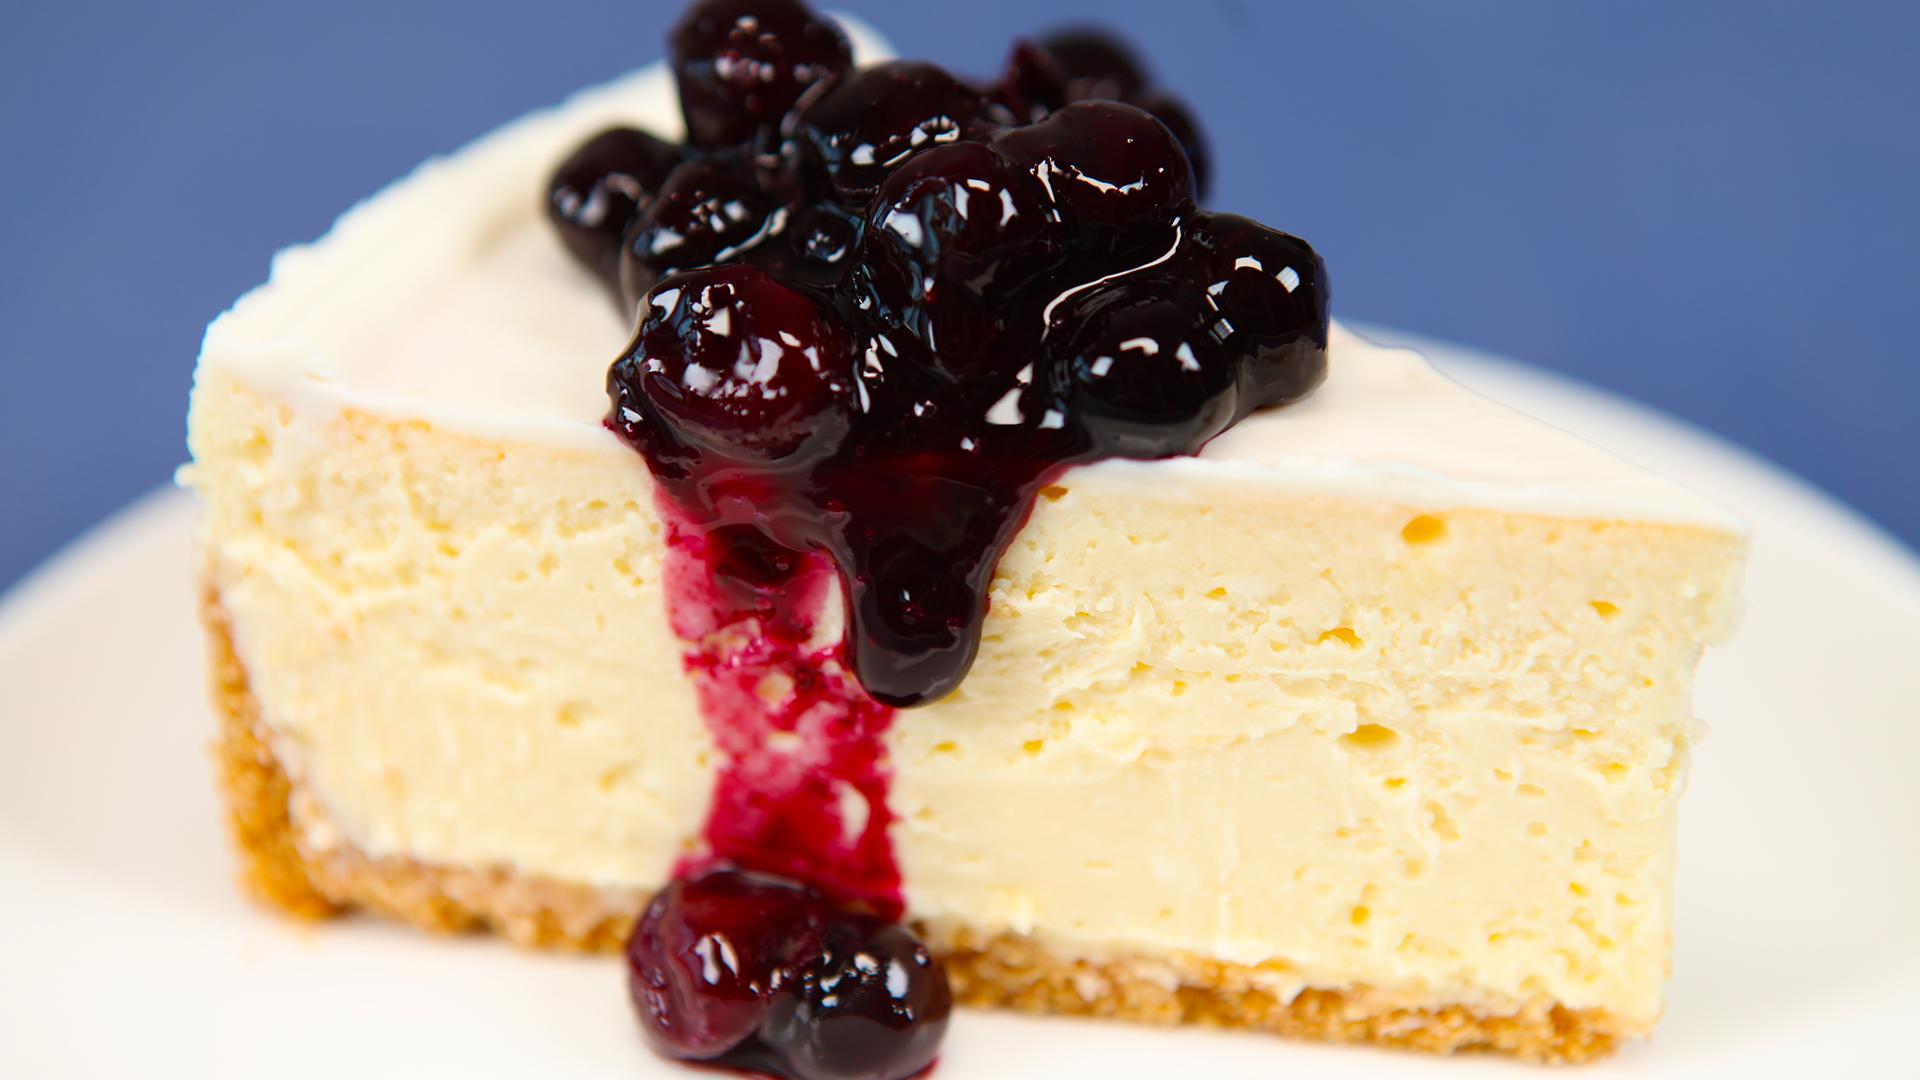 The-cheesecake-factory-original-cheesecake-still.jpg